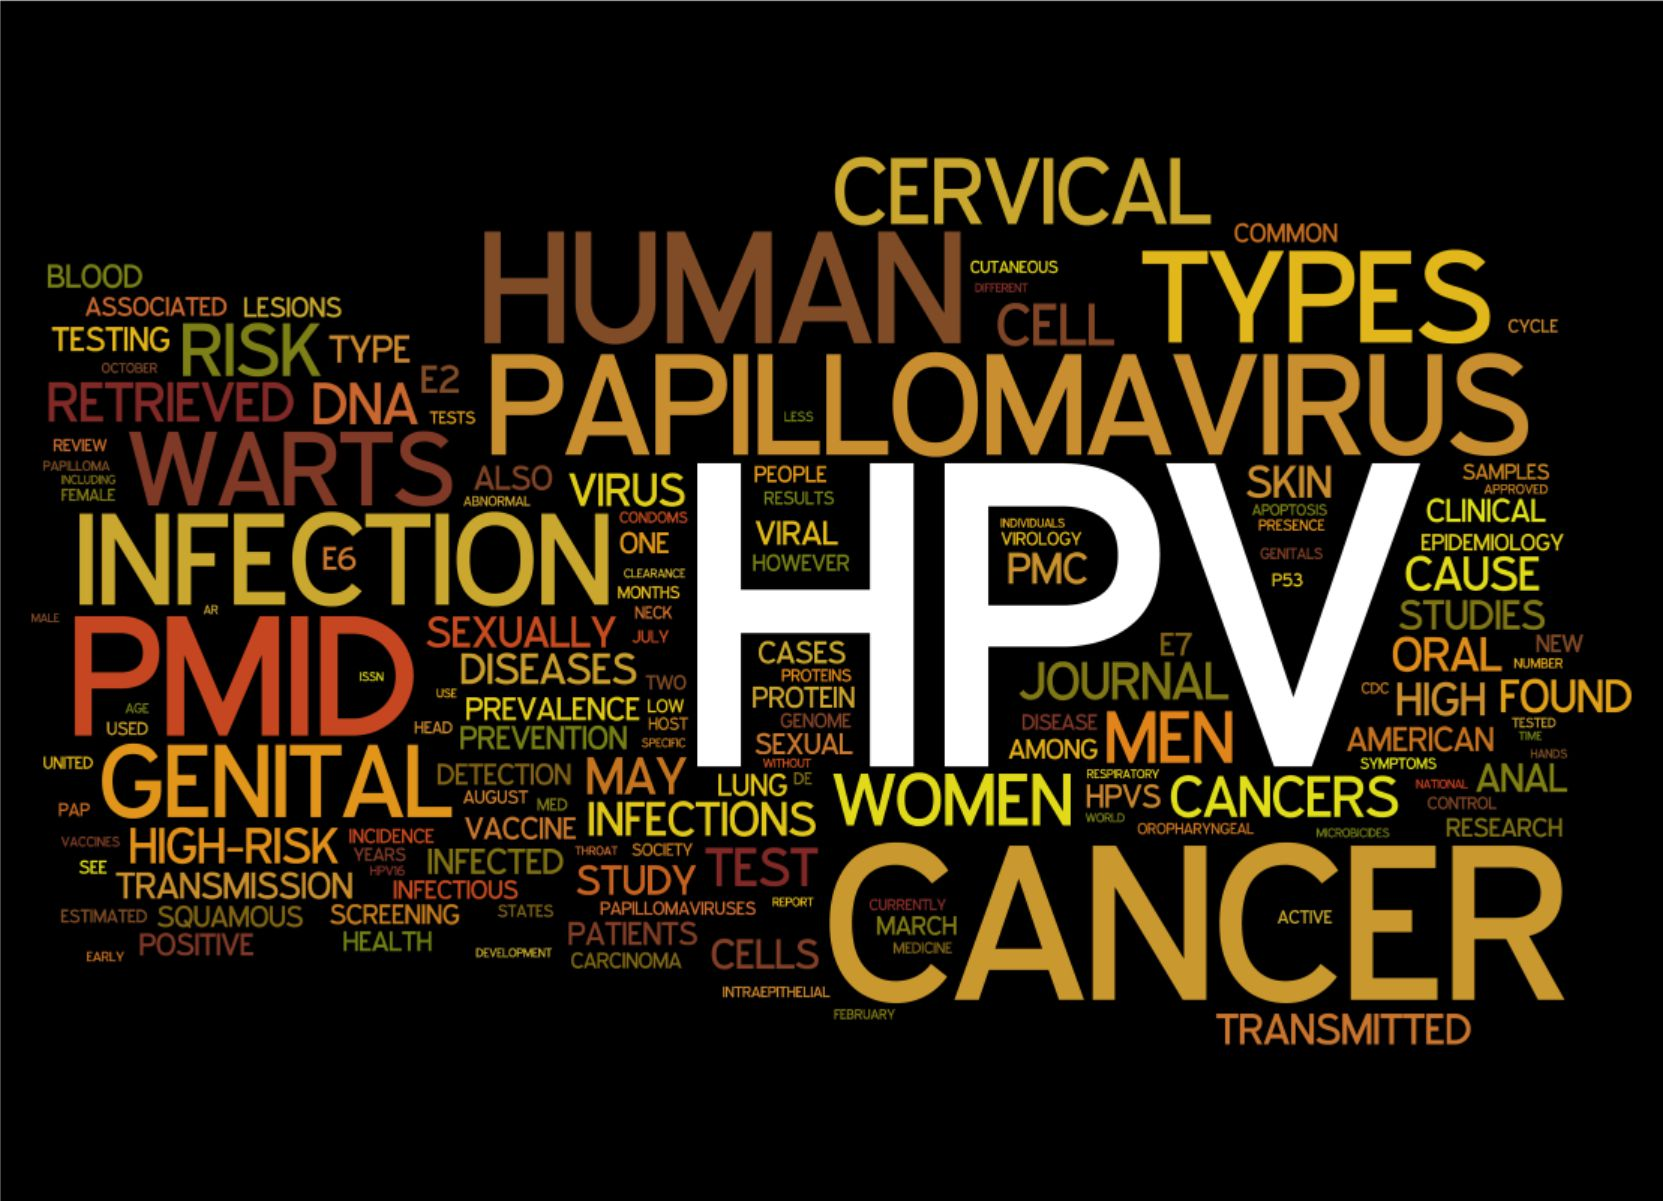 rischio vaccino papilloma virus